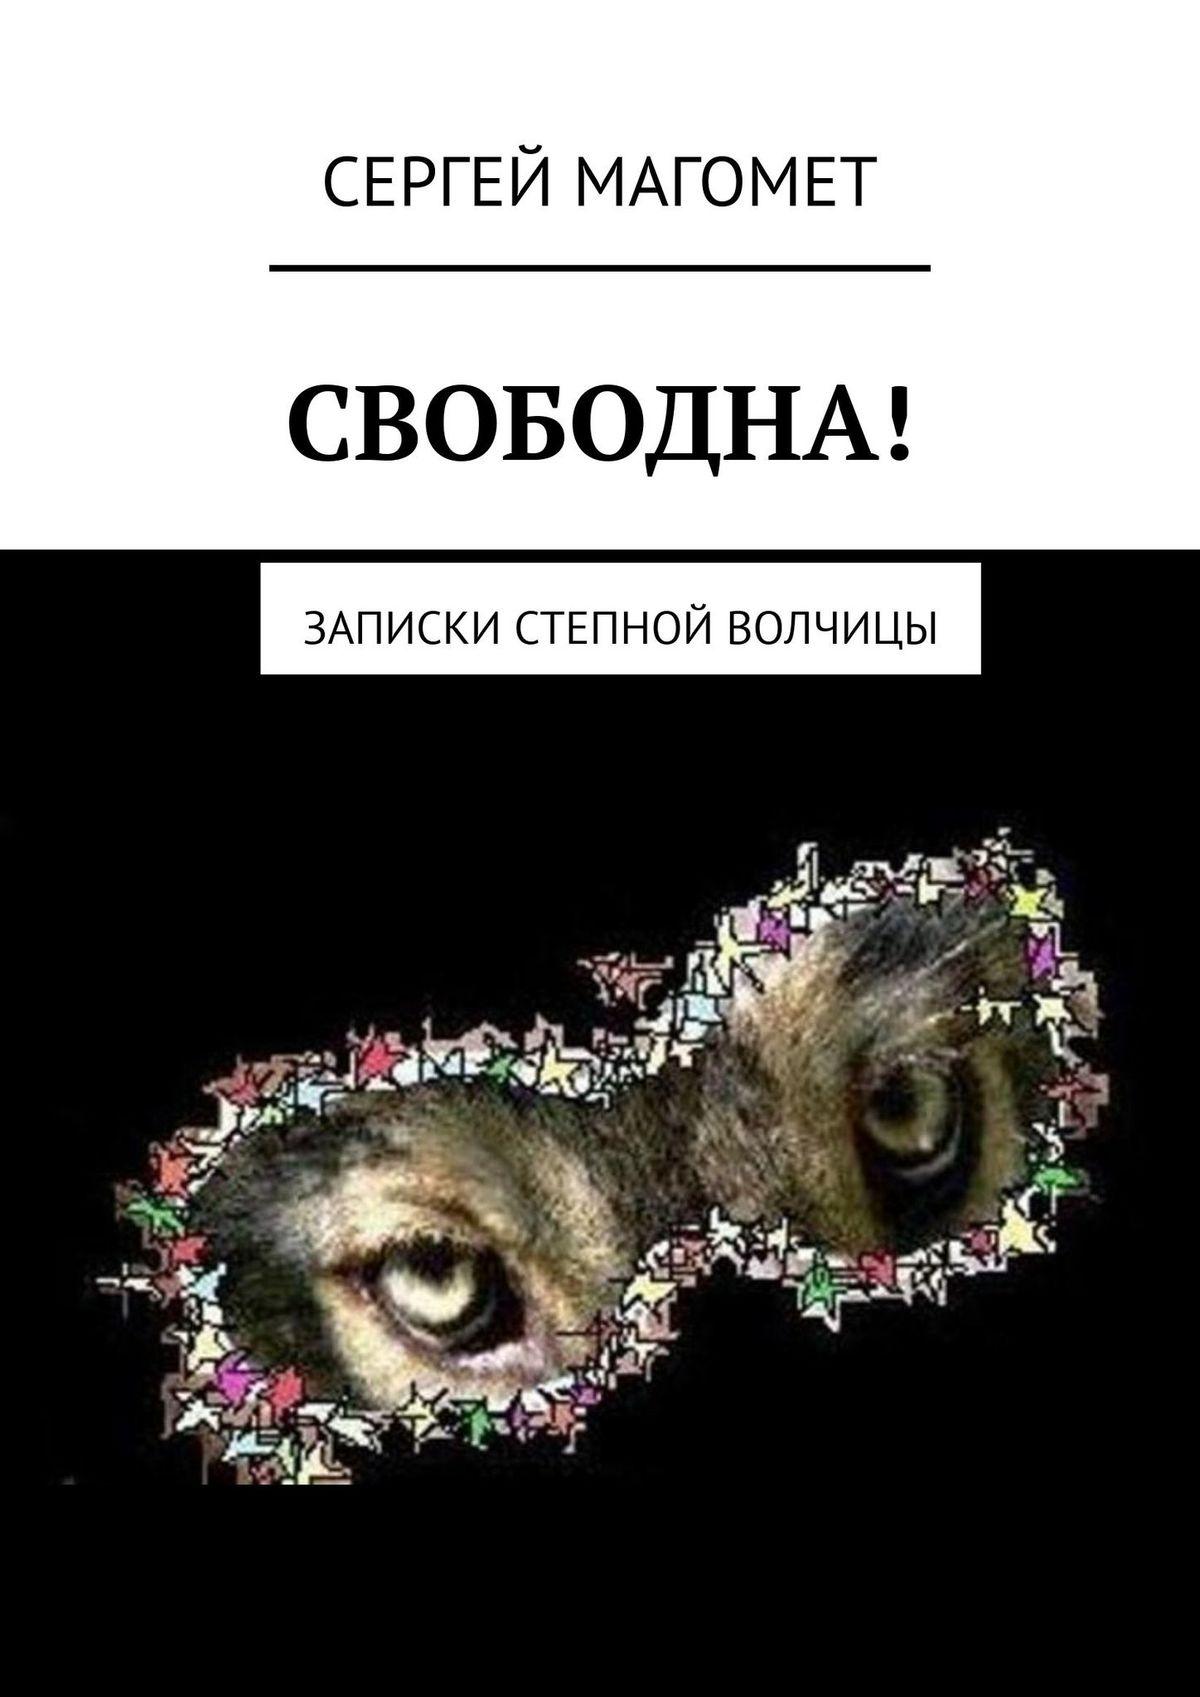 Сергей Магомет Записки степной волчицы сергей магомет записки степной волчицы isbn 9785447447496